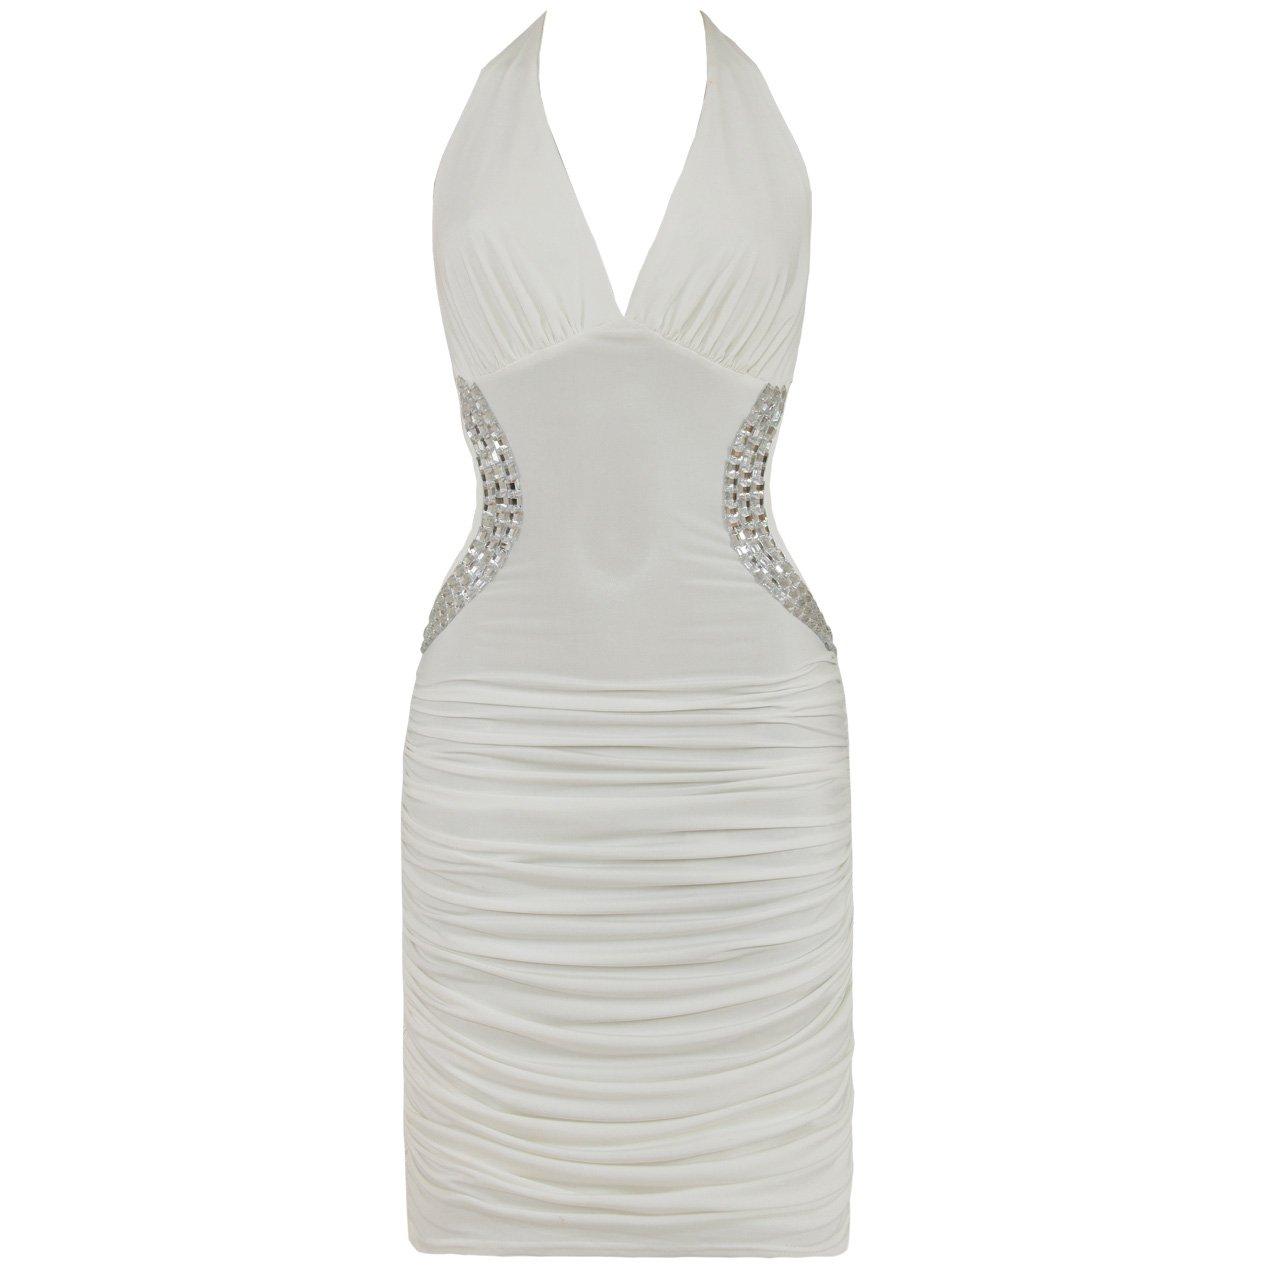 WHITE BACKLESS JEWEL HALTERNECK EVENING MINI CLUBWEAR BODYCON PARTY DRESS UK 12-14, US 8-10